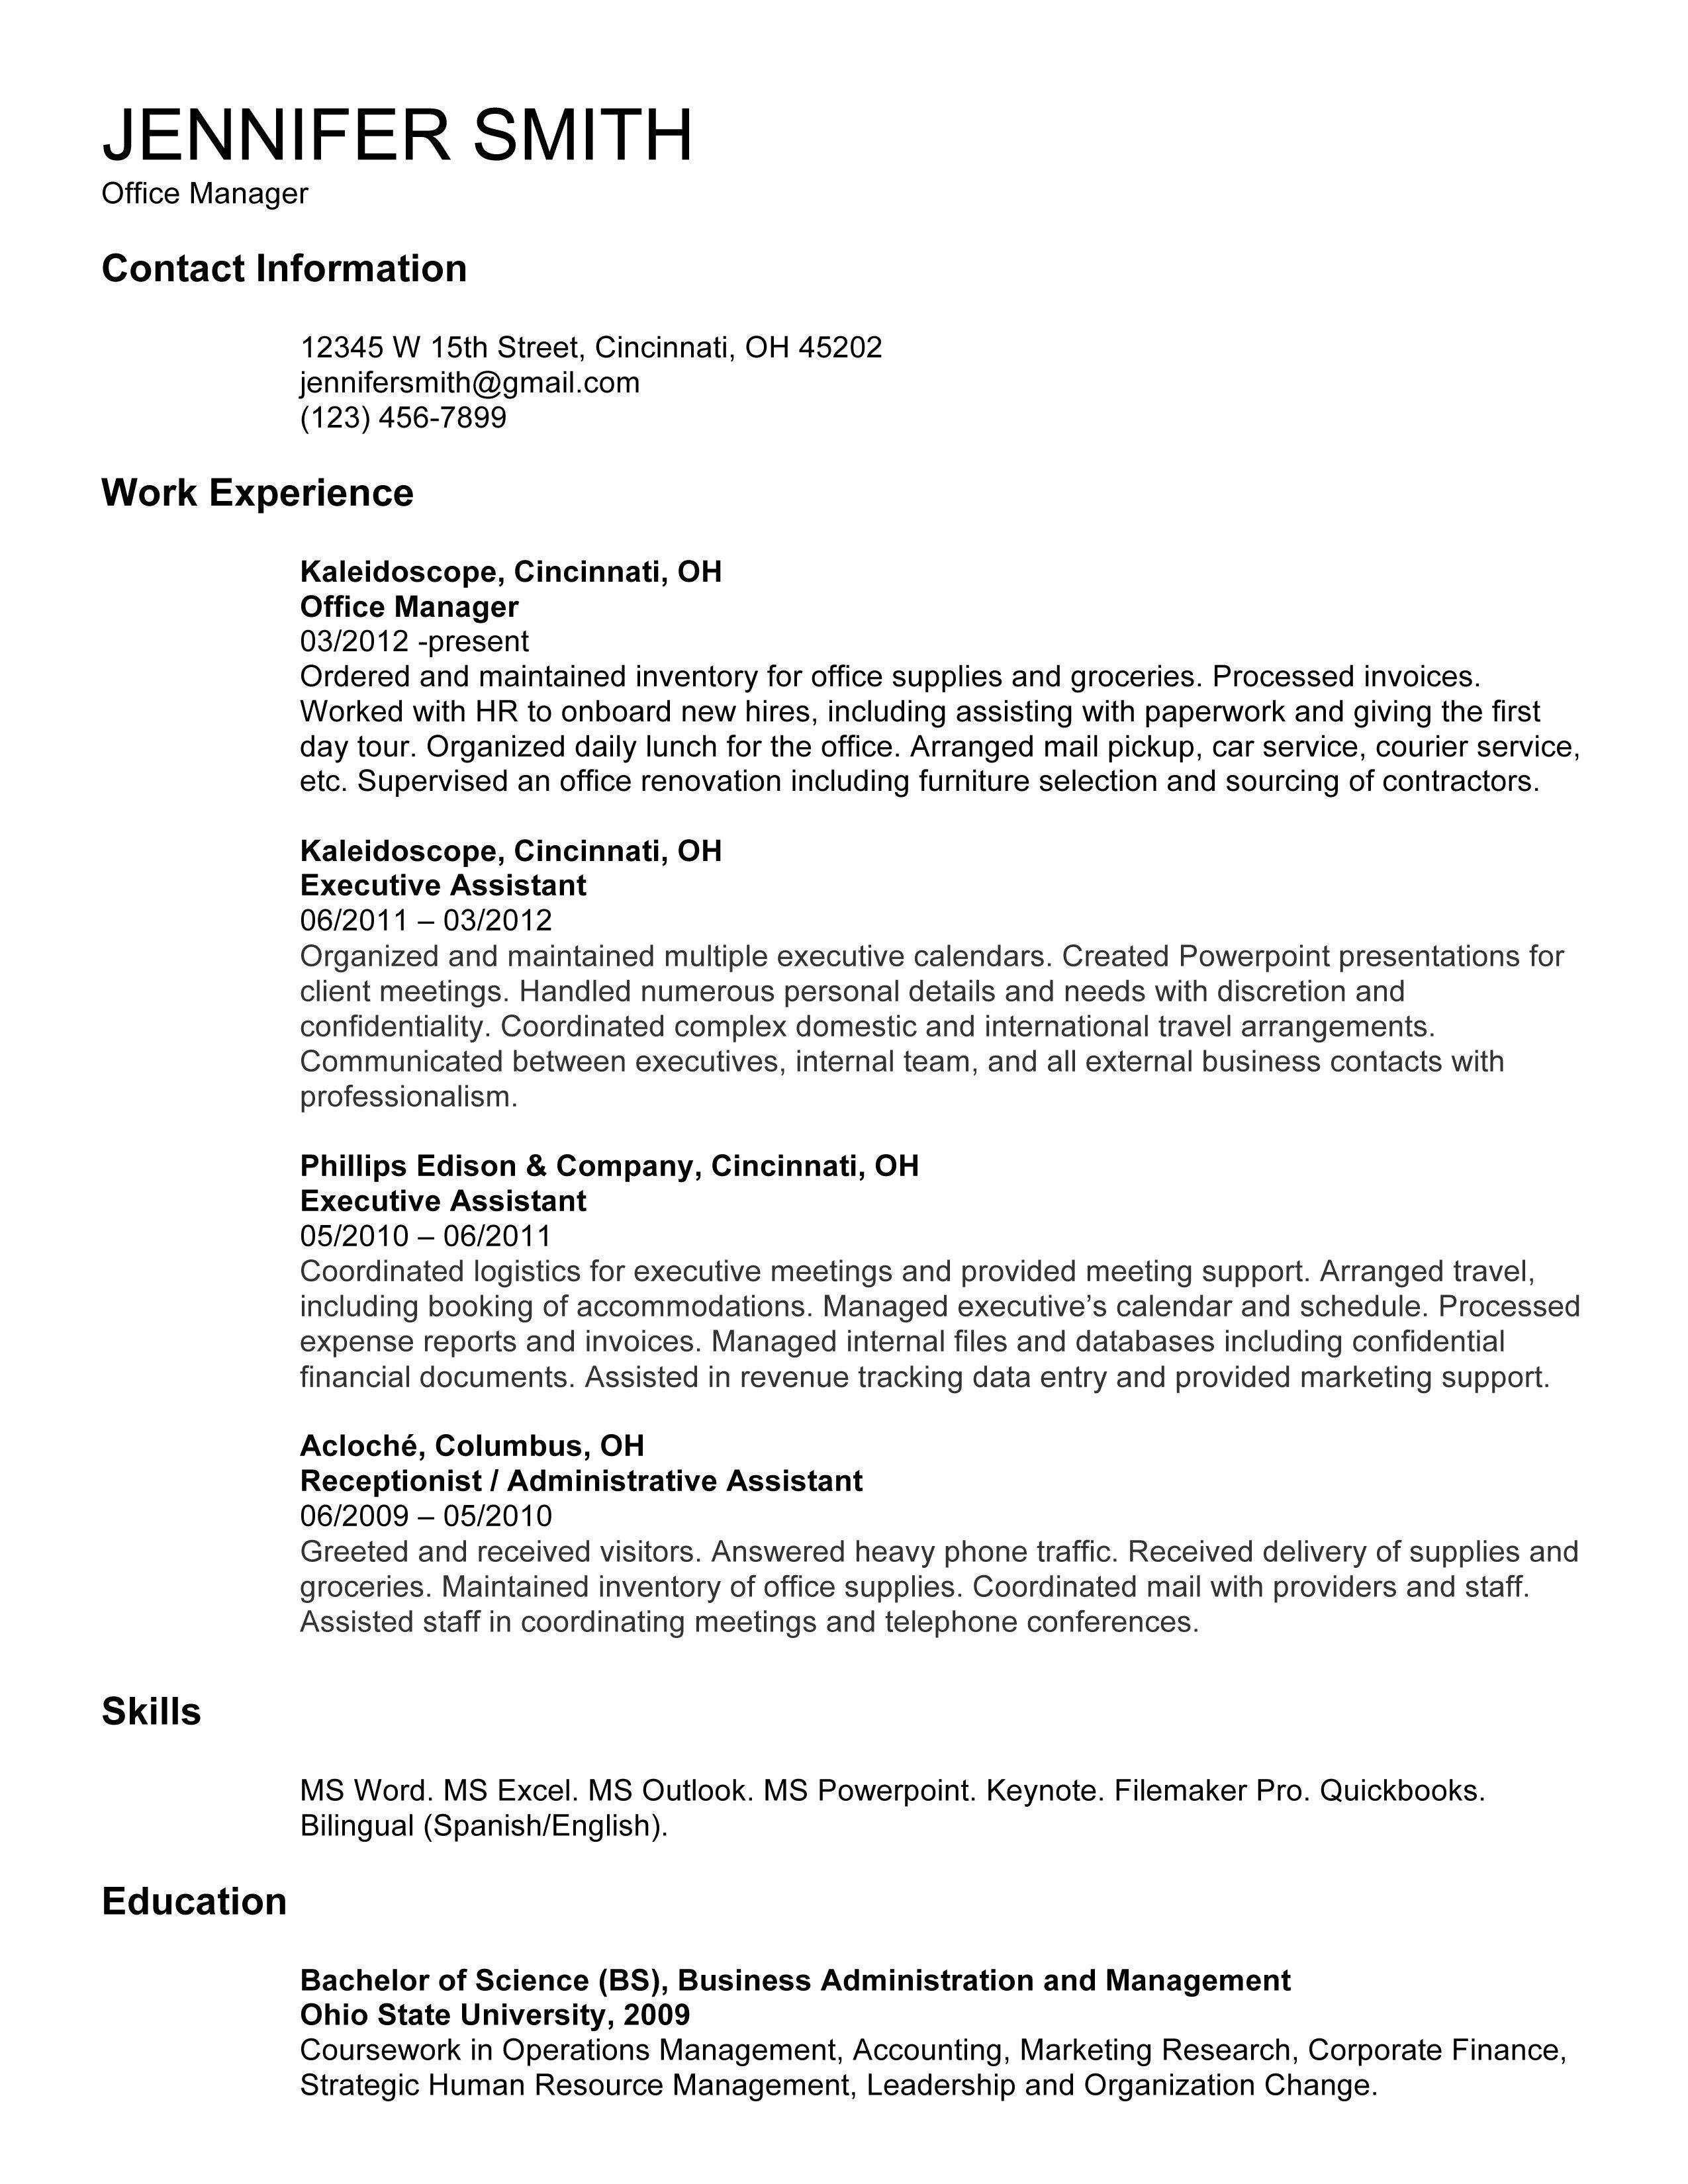 Diving Supervisor Cover Letter Bank Processor Sample Resume Service Manager  Samples Visualcv Resumehtml